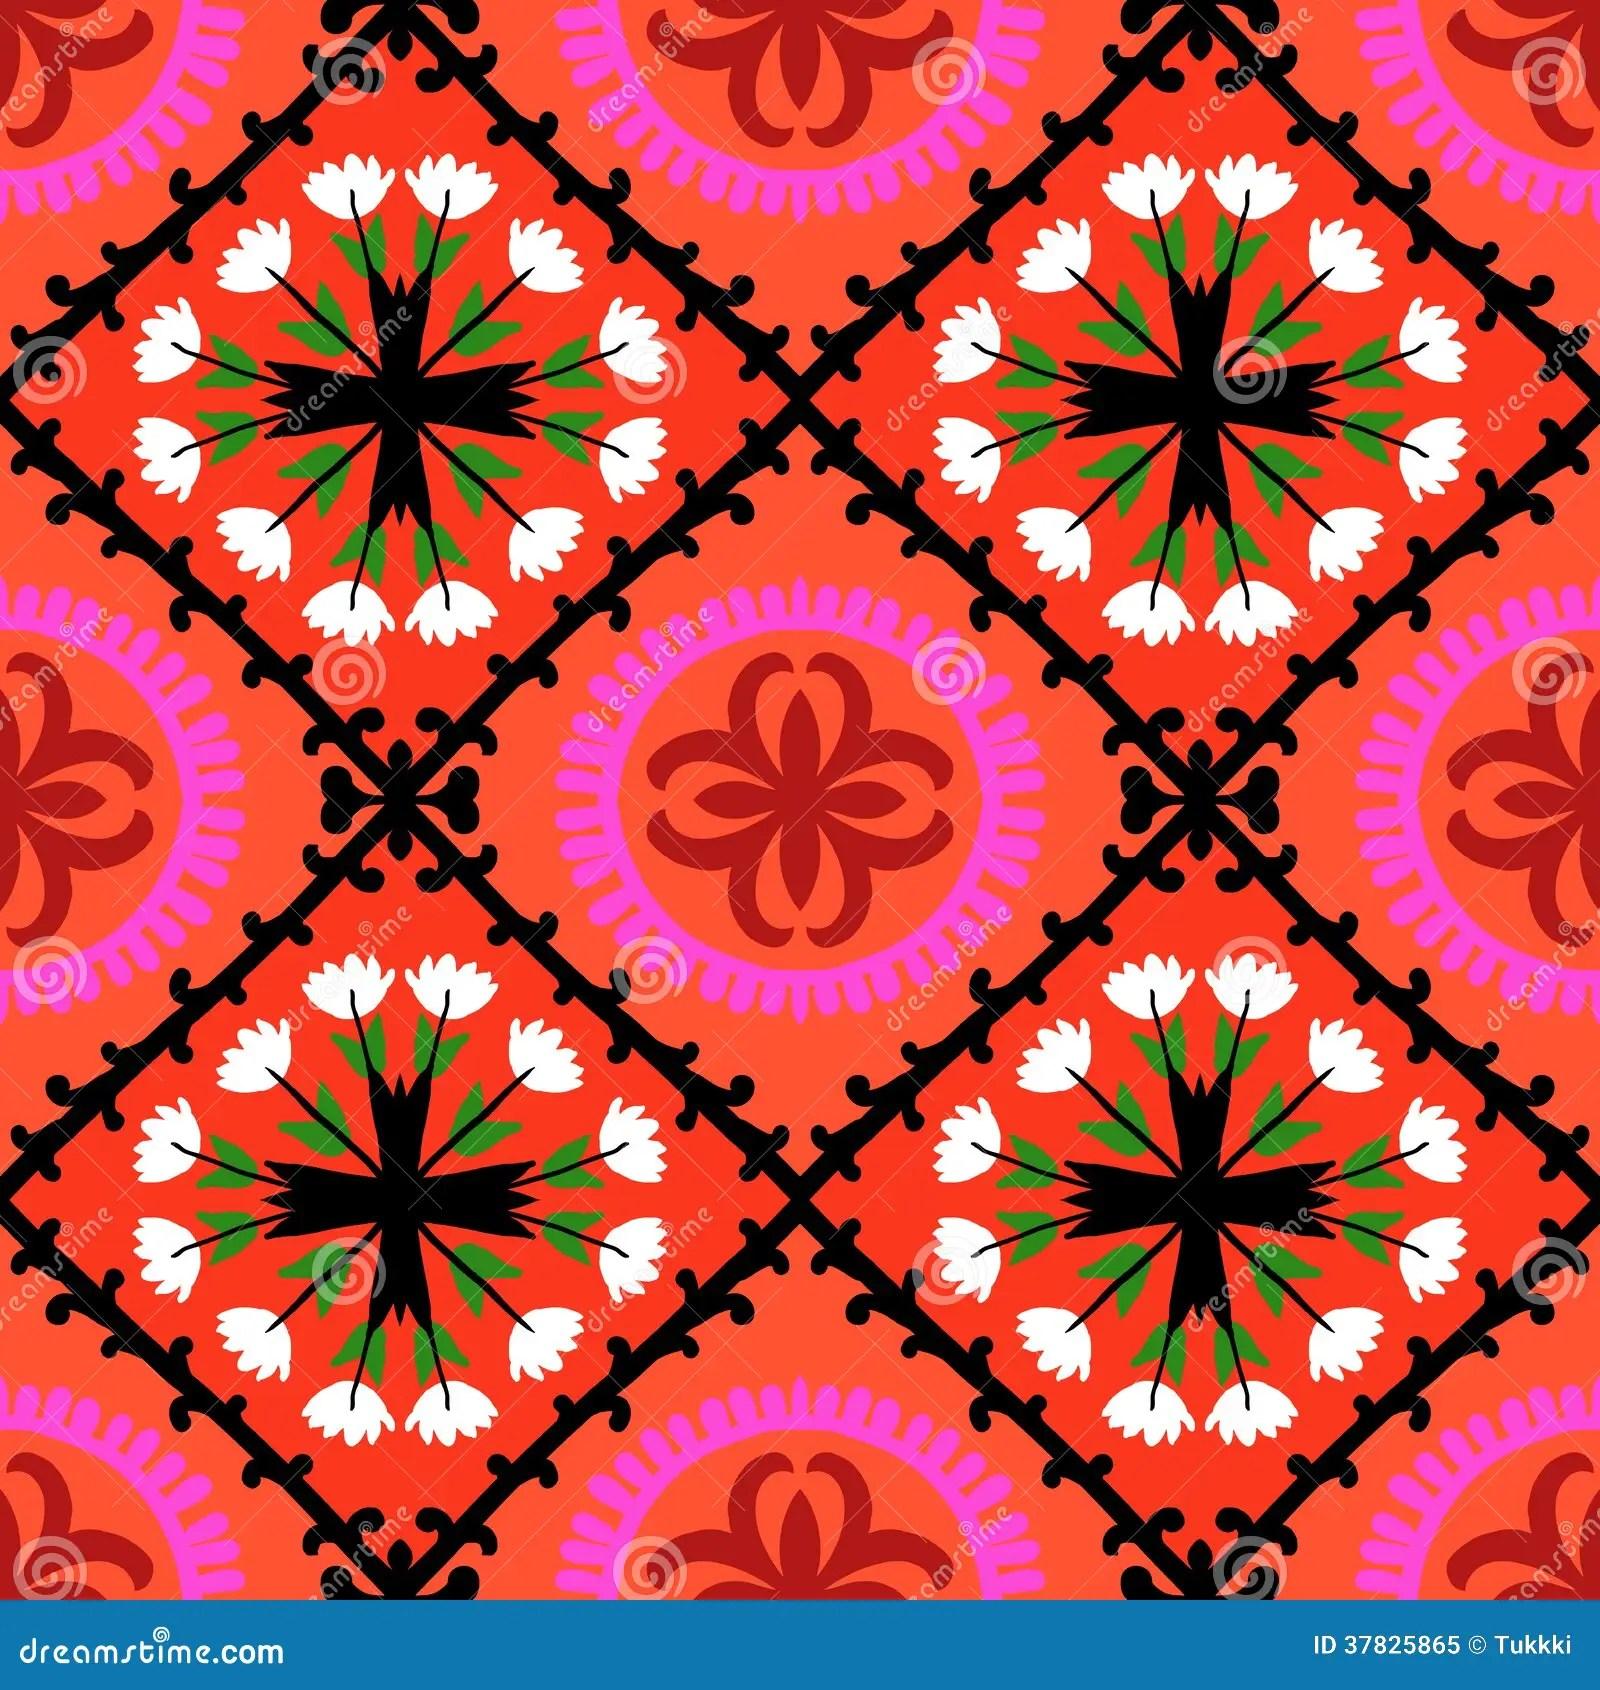 Vector Wallpaper Fall Colors Suzani Pattern With Uzbek And Kazakh Motifs Royalty Free